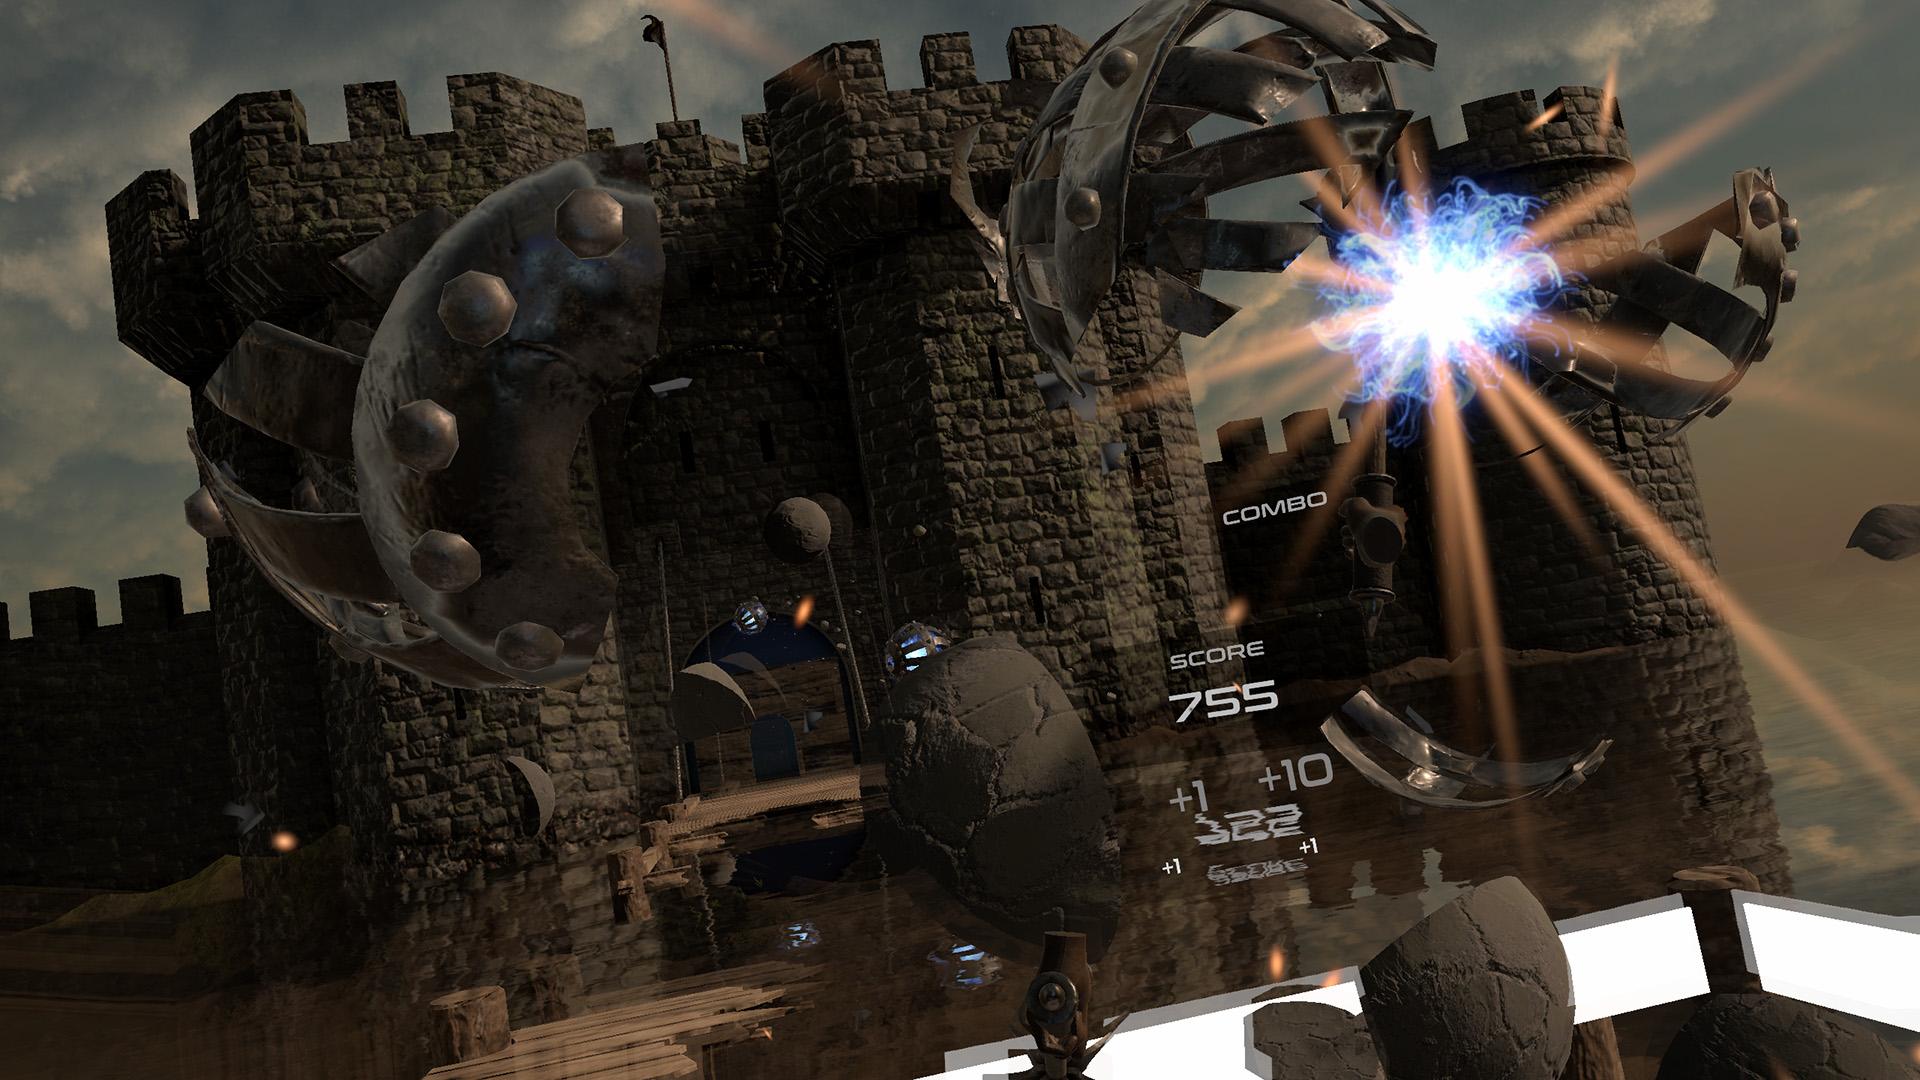 PowerBeatsVR - Intense Rhythm-Based VR Fitness Game